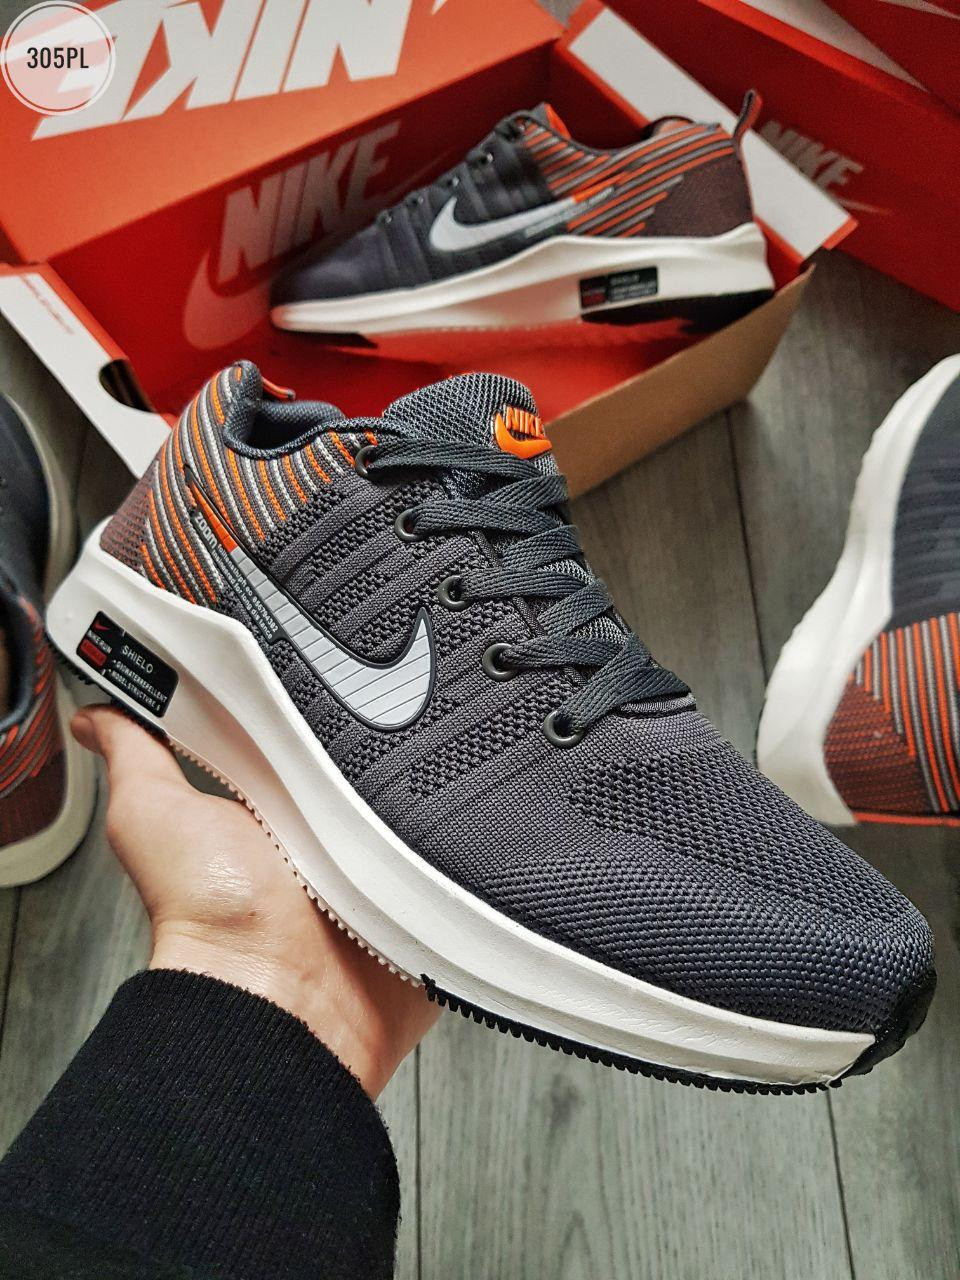 Мужские кроссовки Nike Air Zооm Grey серые р. 41-44